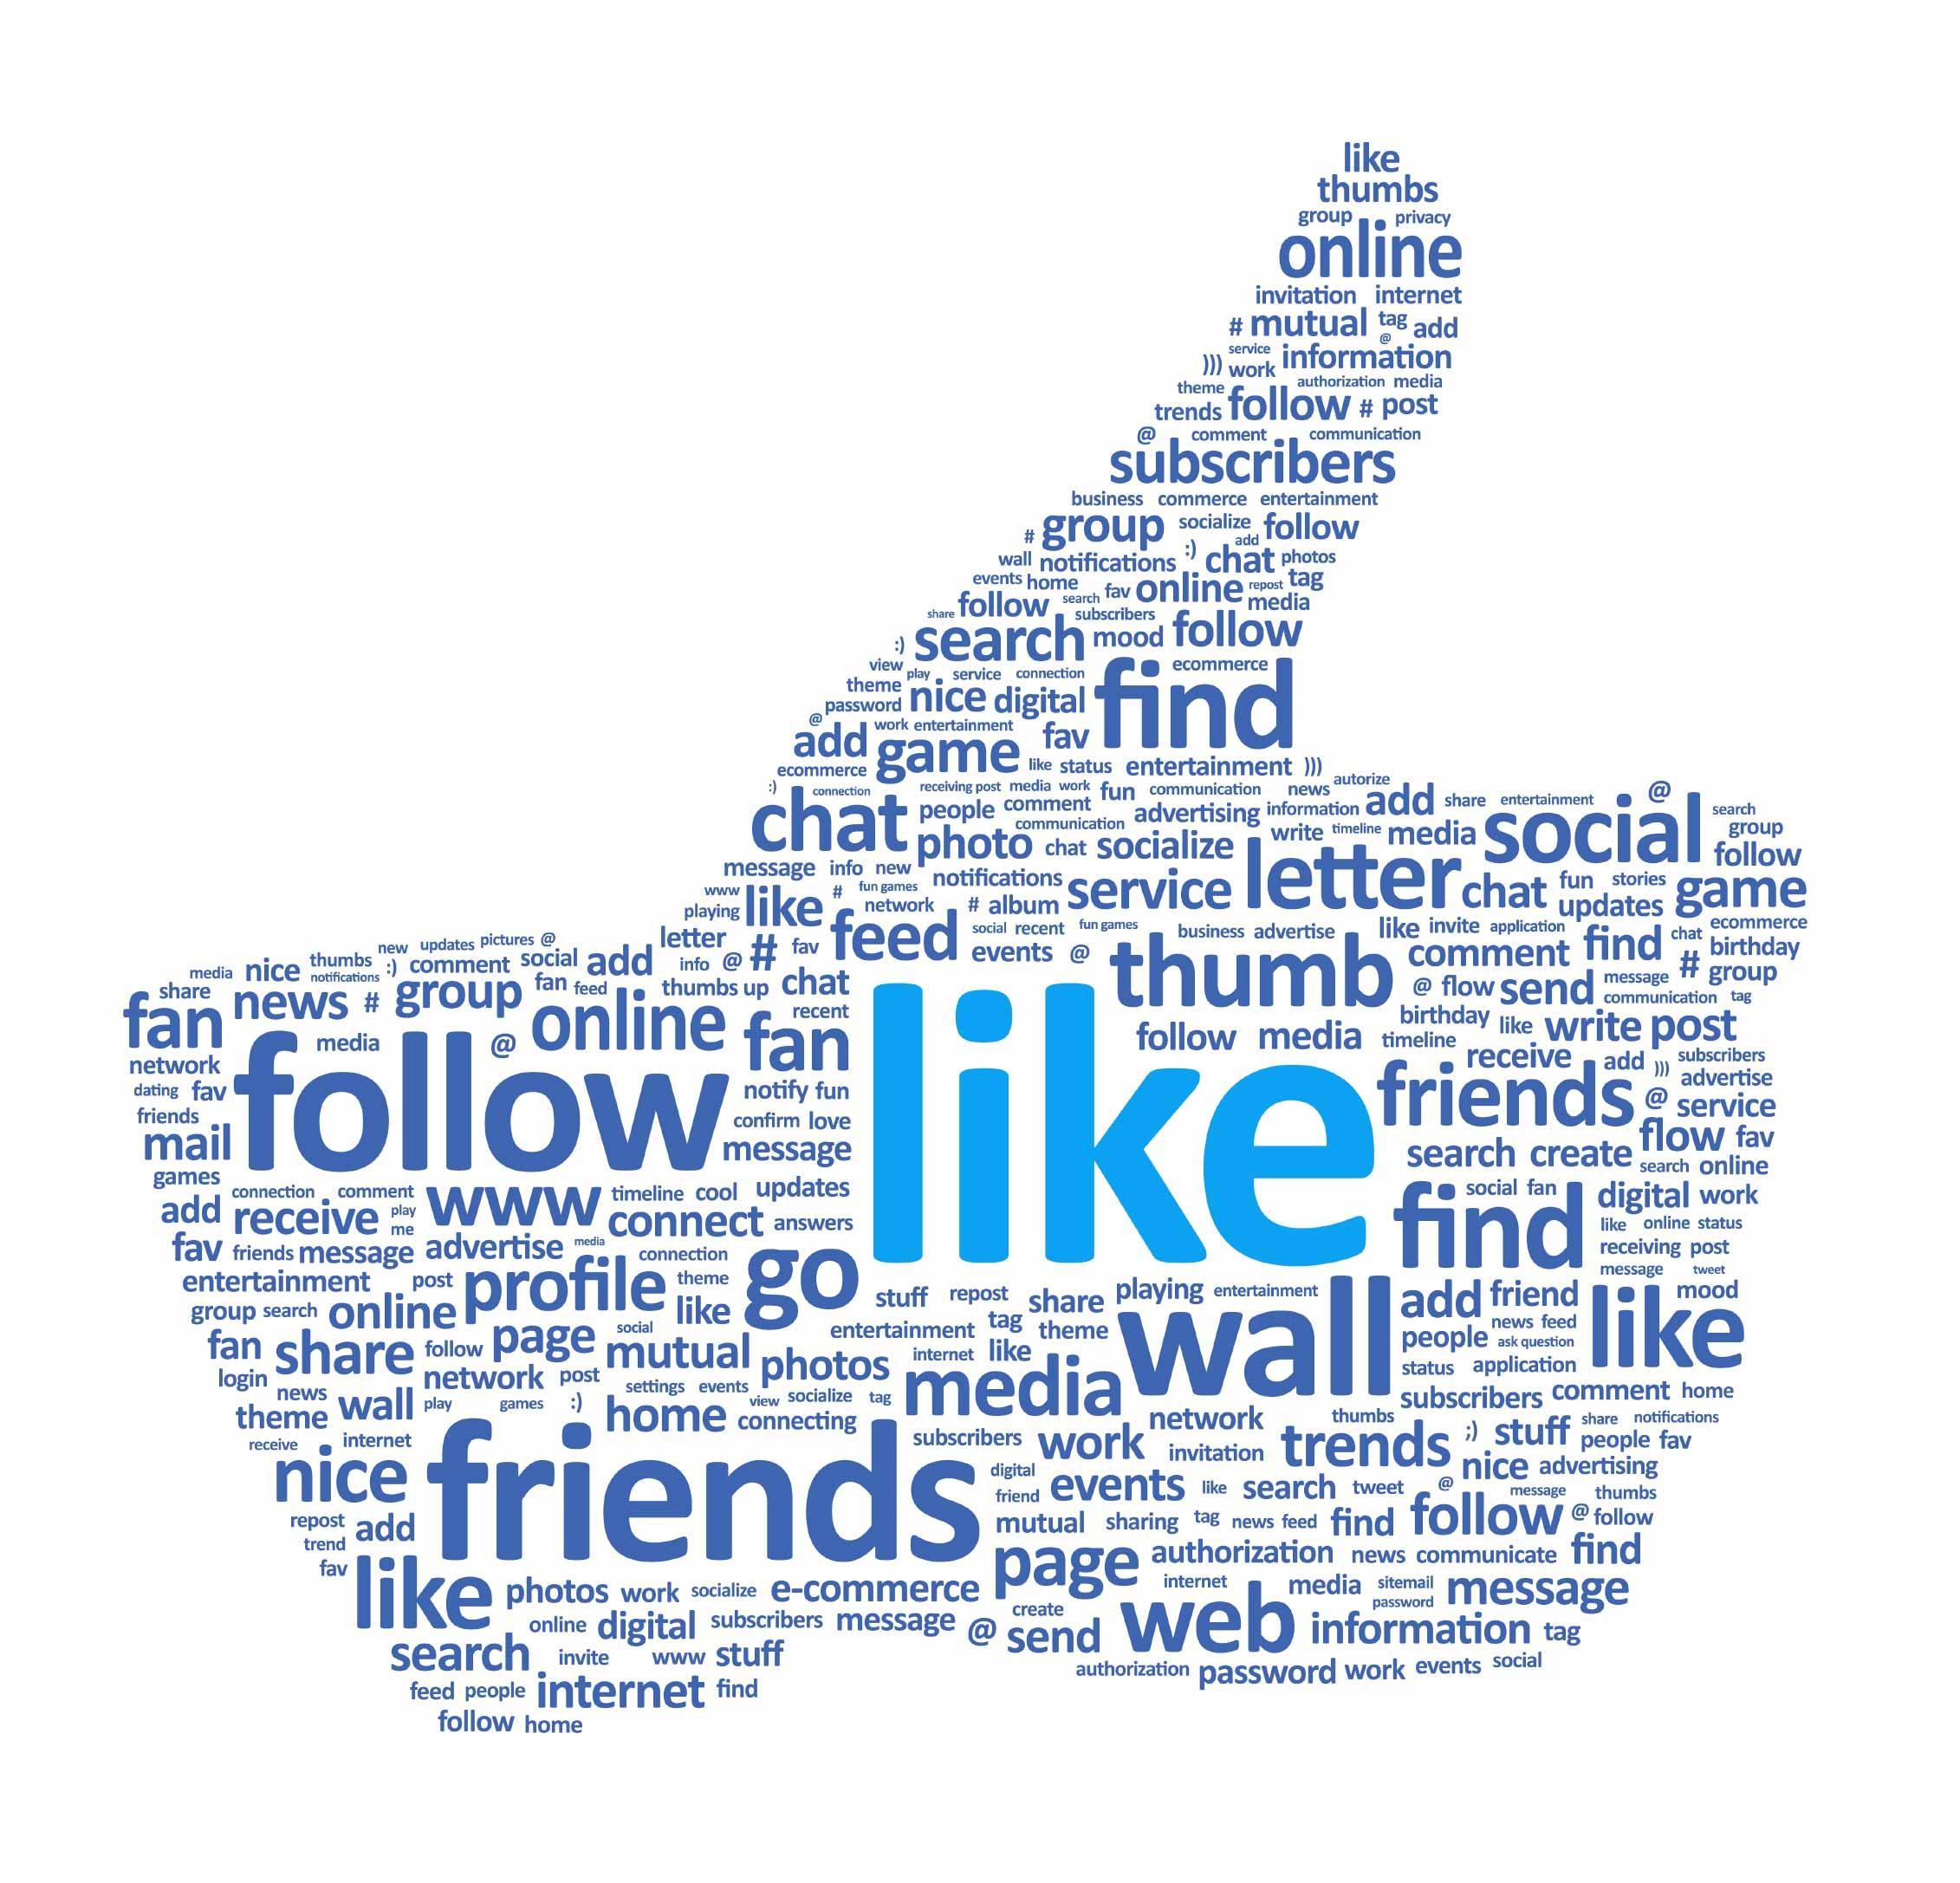 nhung-sai-lam-khien-marketing-facebook-khong-hieu-qua